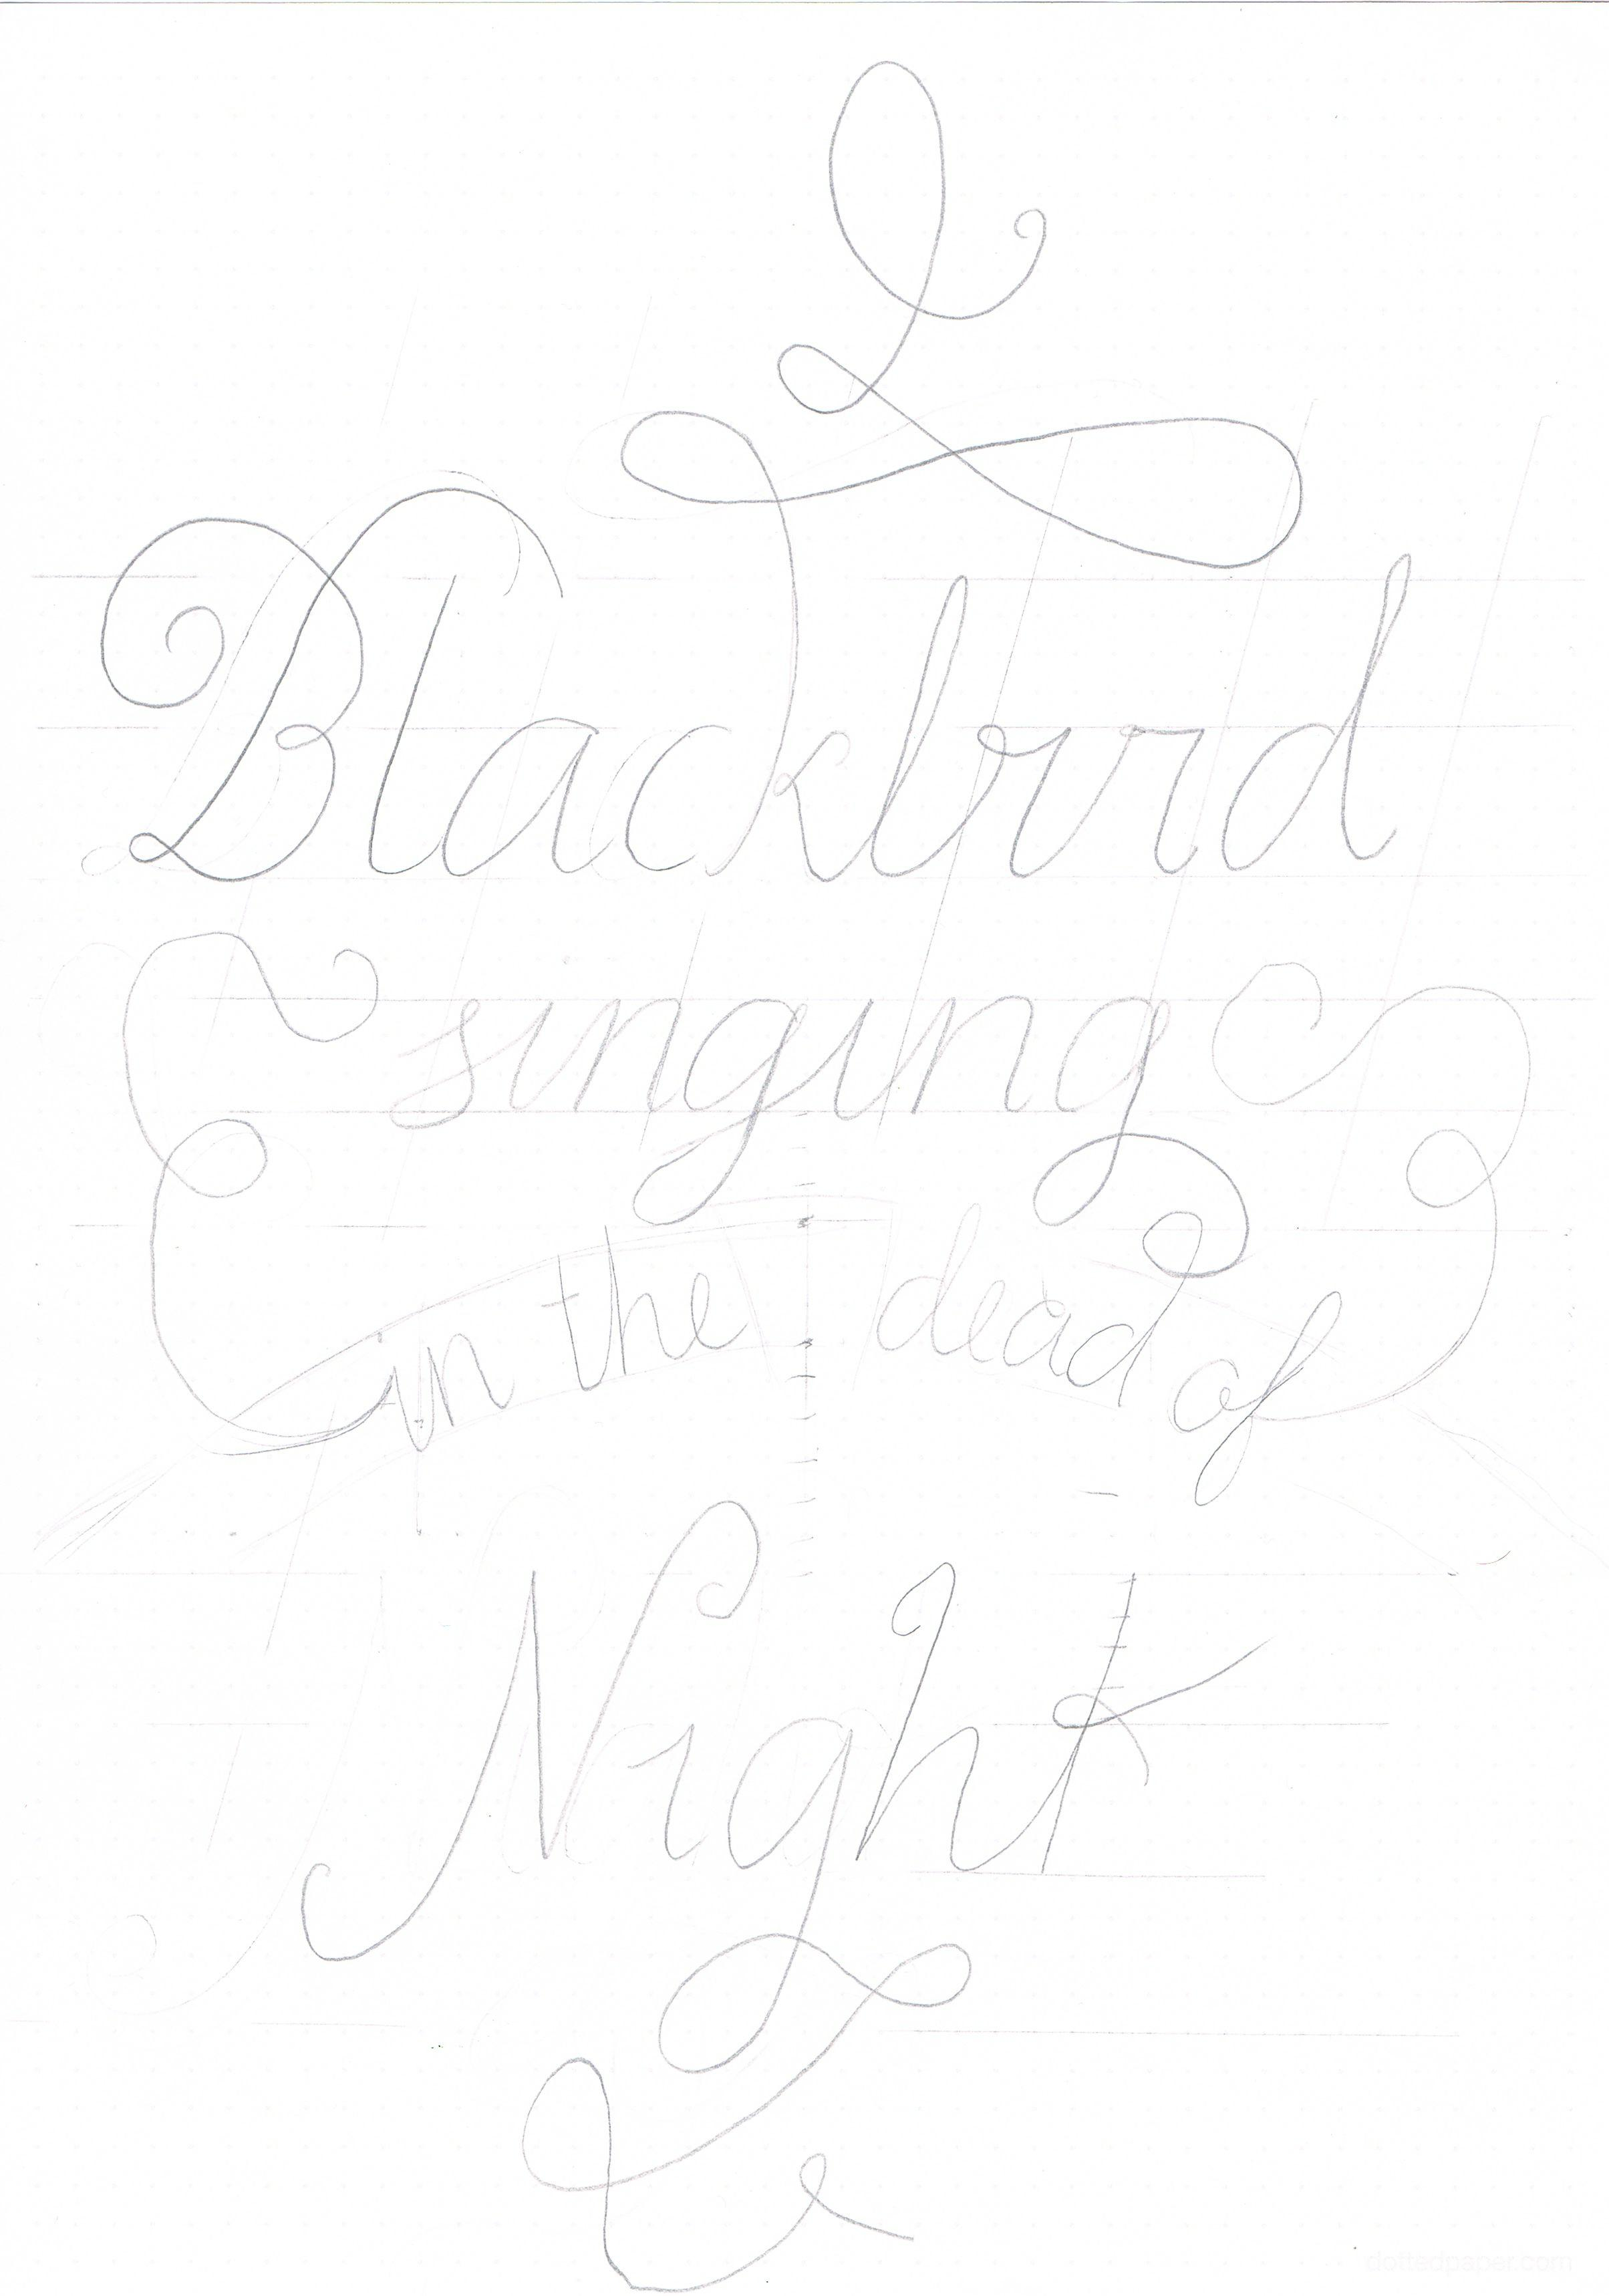 Blackbird. - image 2 - student project